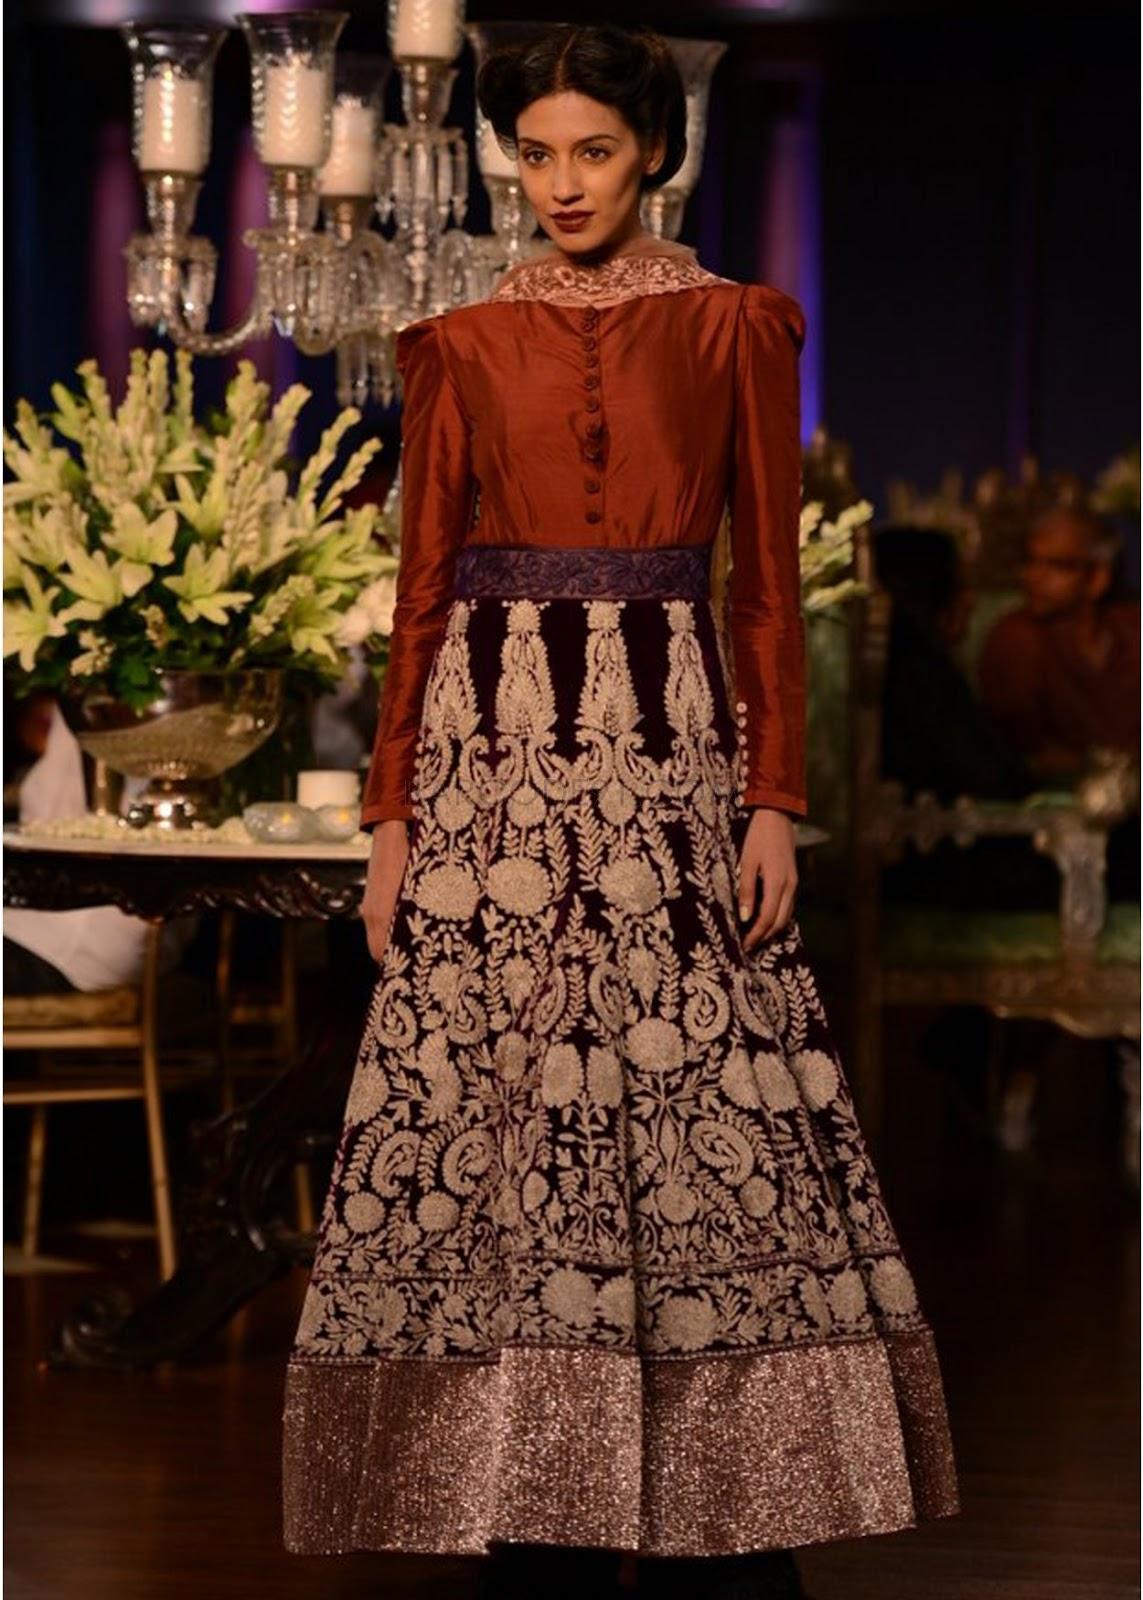 manish delhi malhotra couture week collection pcj latest lehenga pm dresses padukone deepika